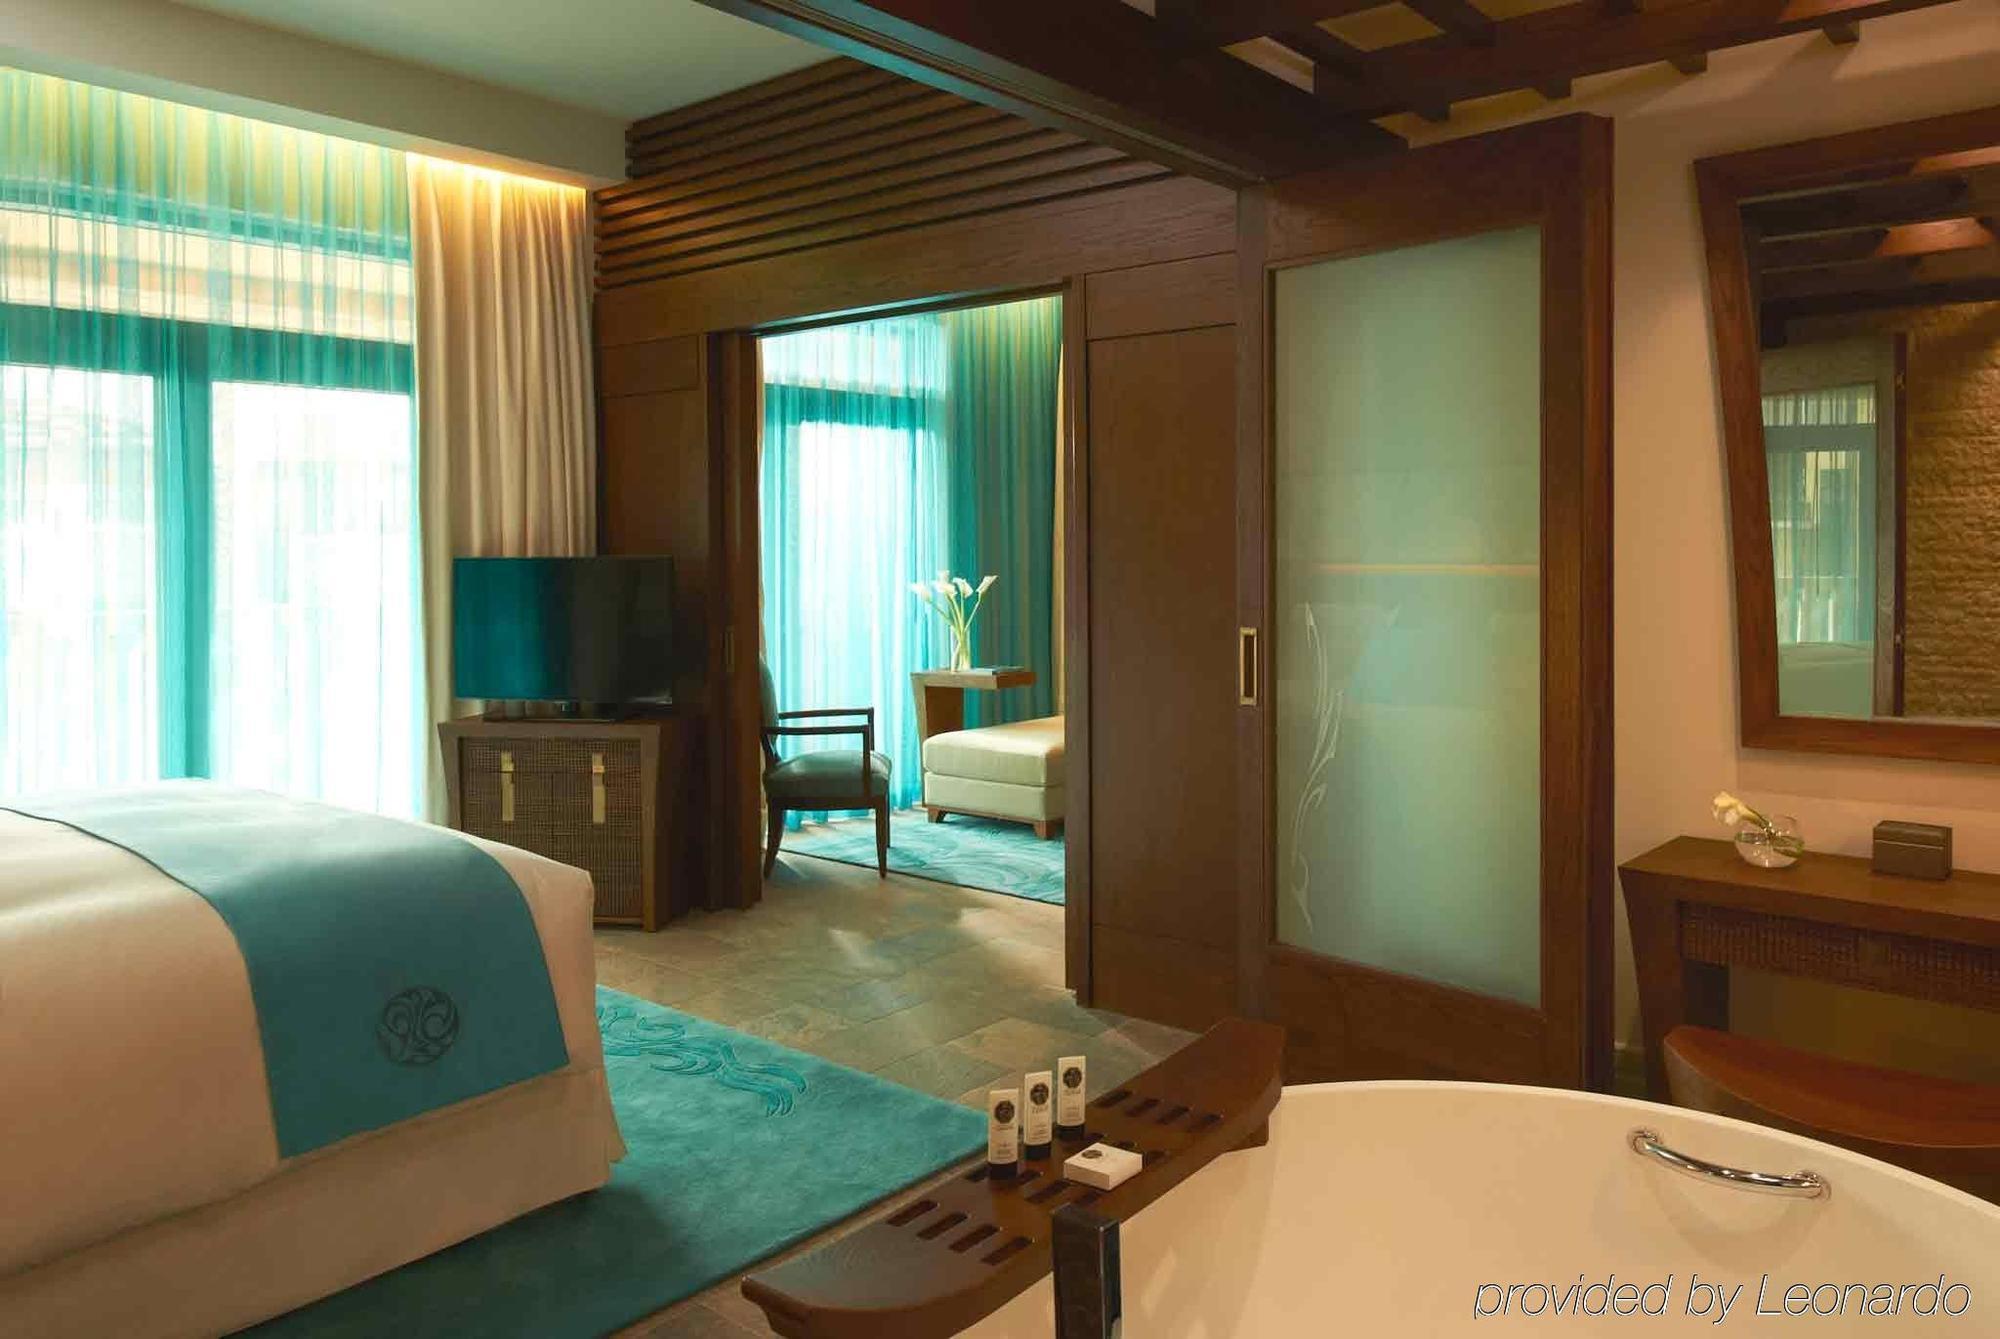 Sofitel dubai the palm resort spa dubai for Best spa hotel dubai